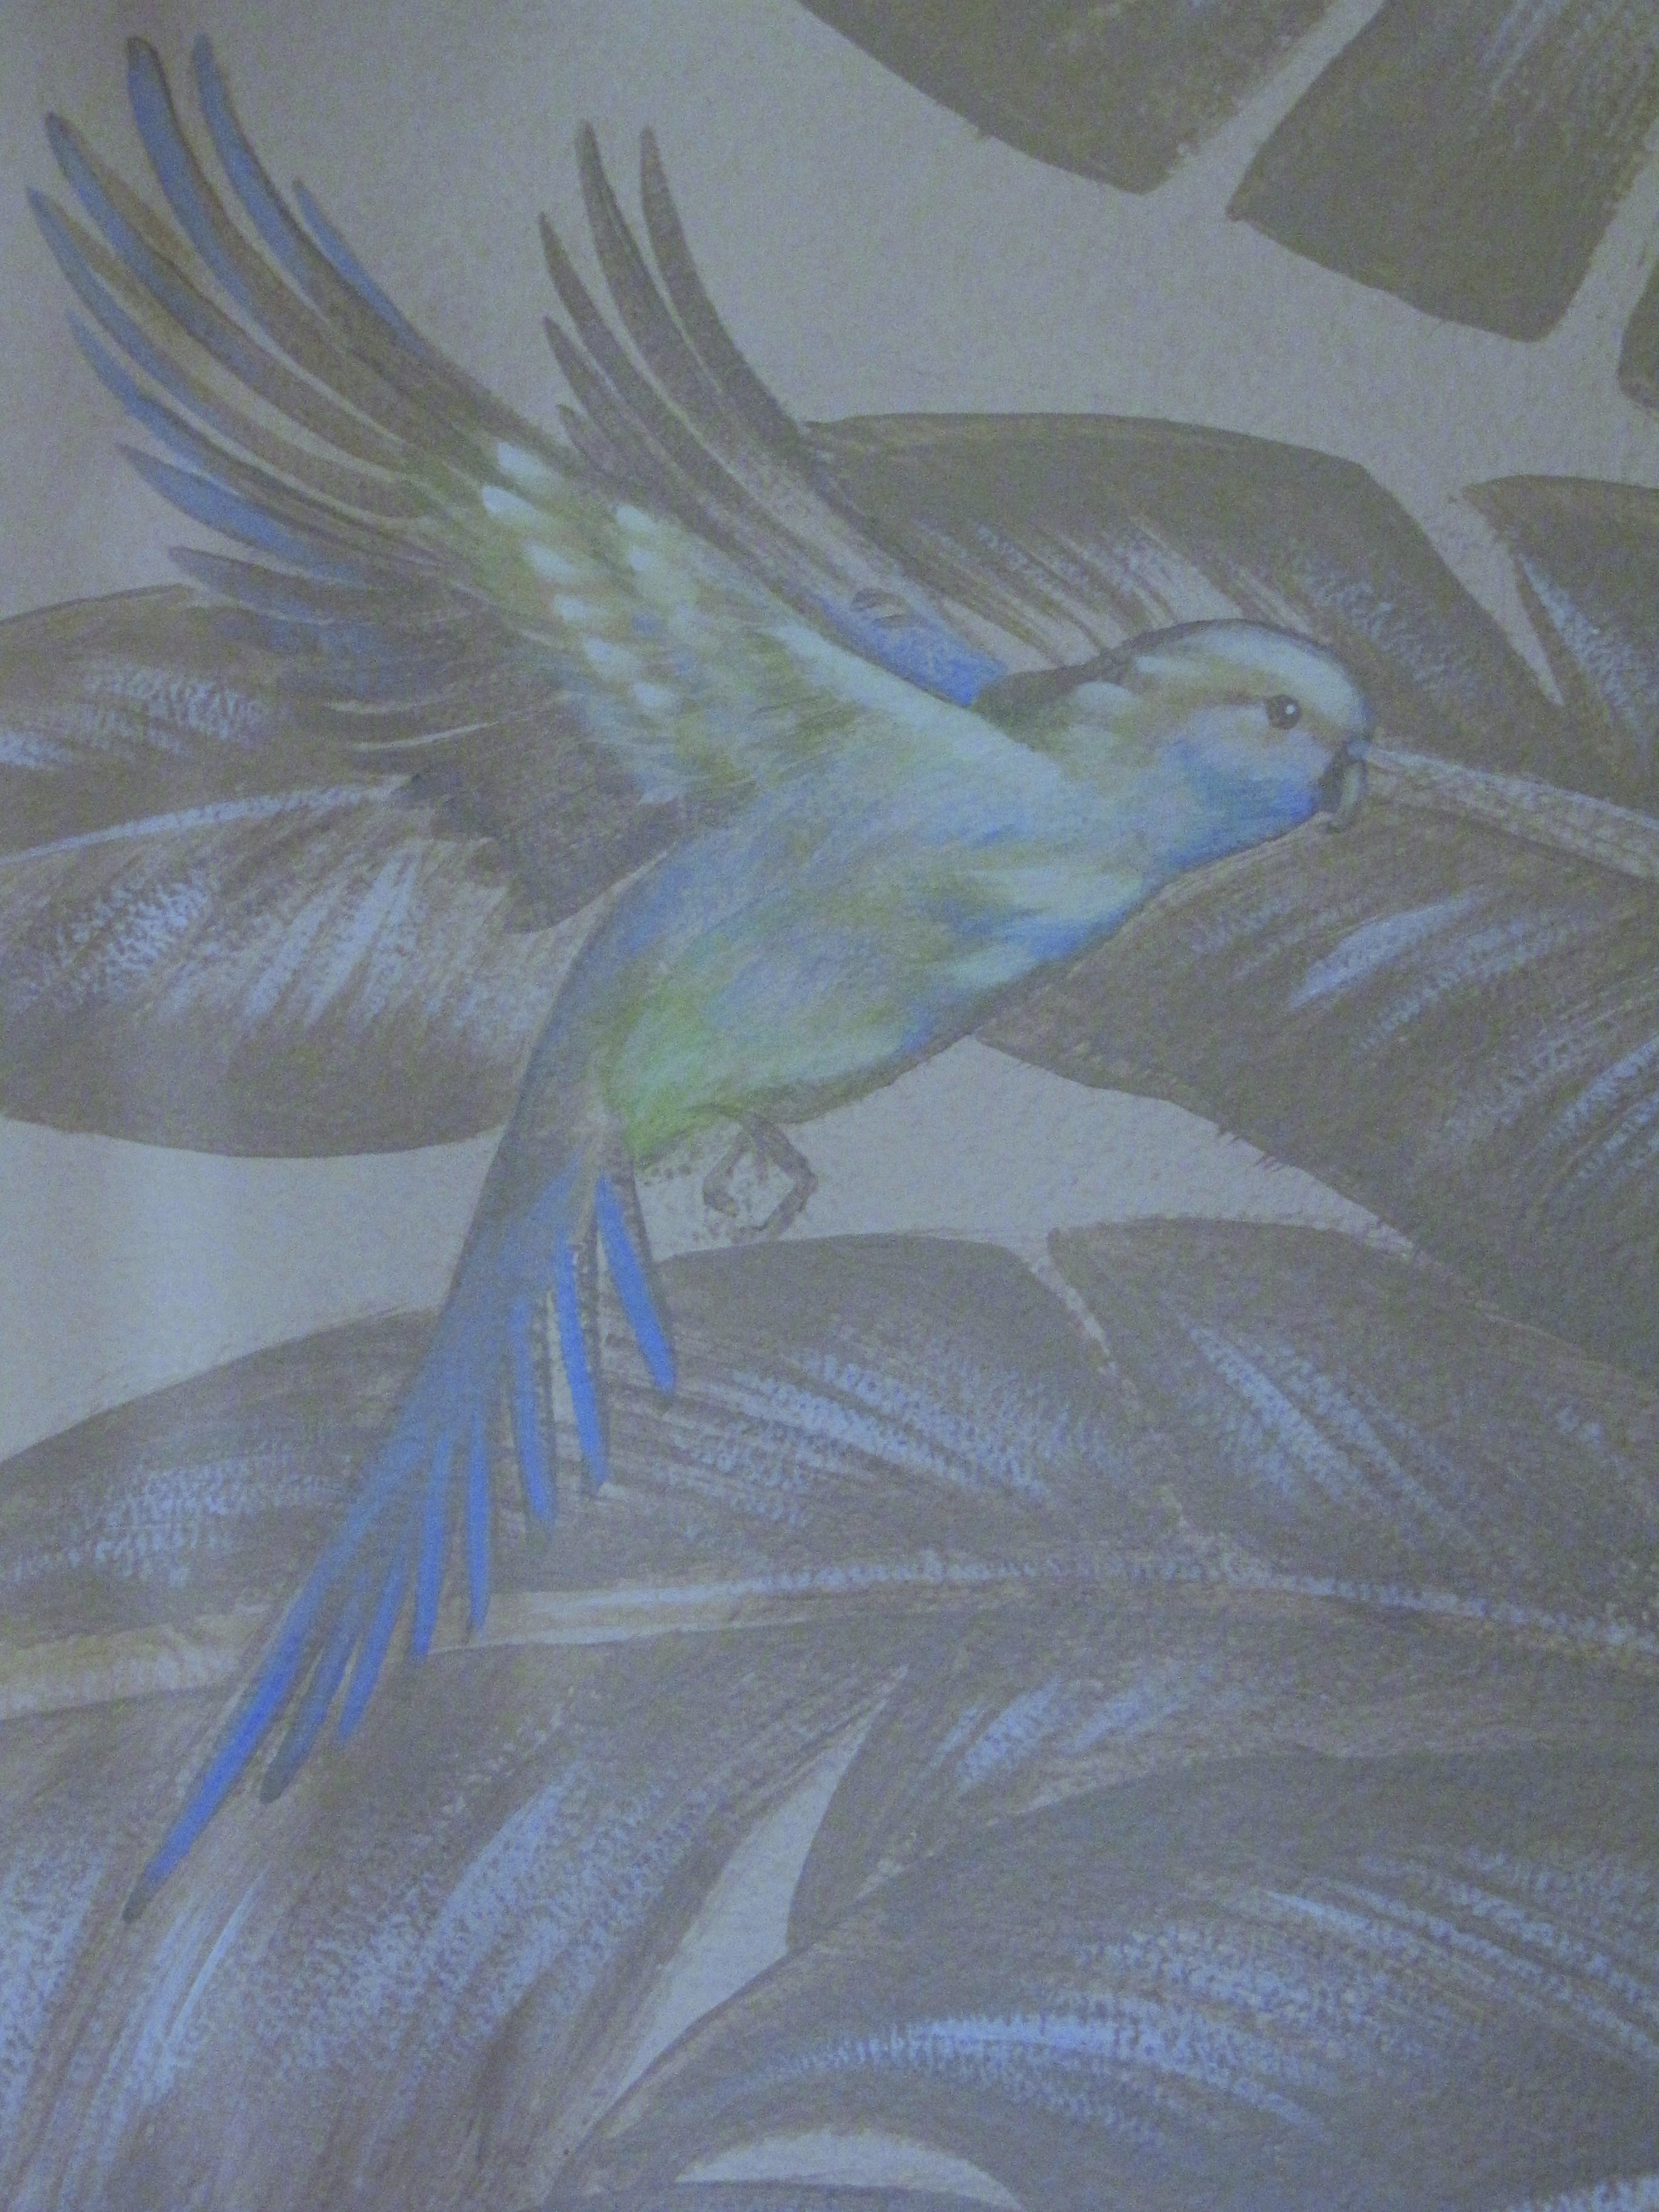 parakeetflight.jpg